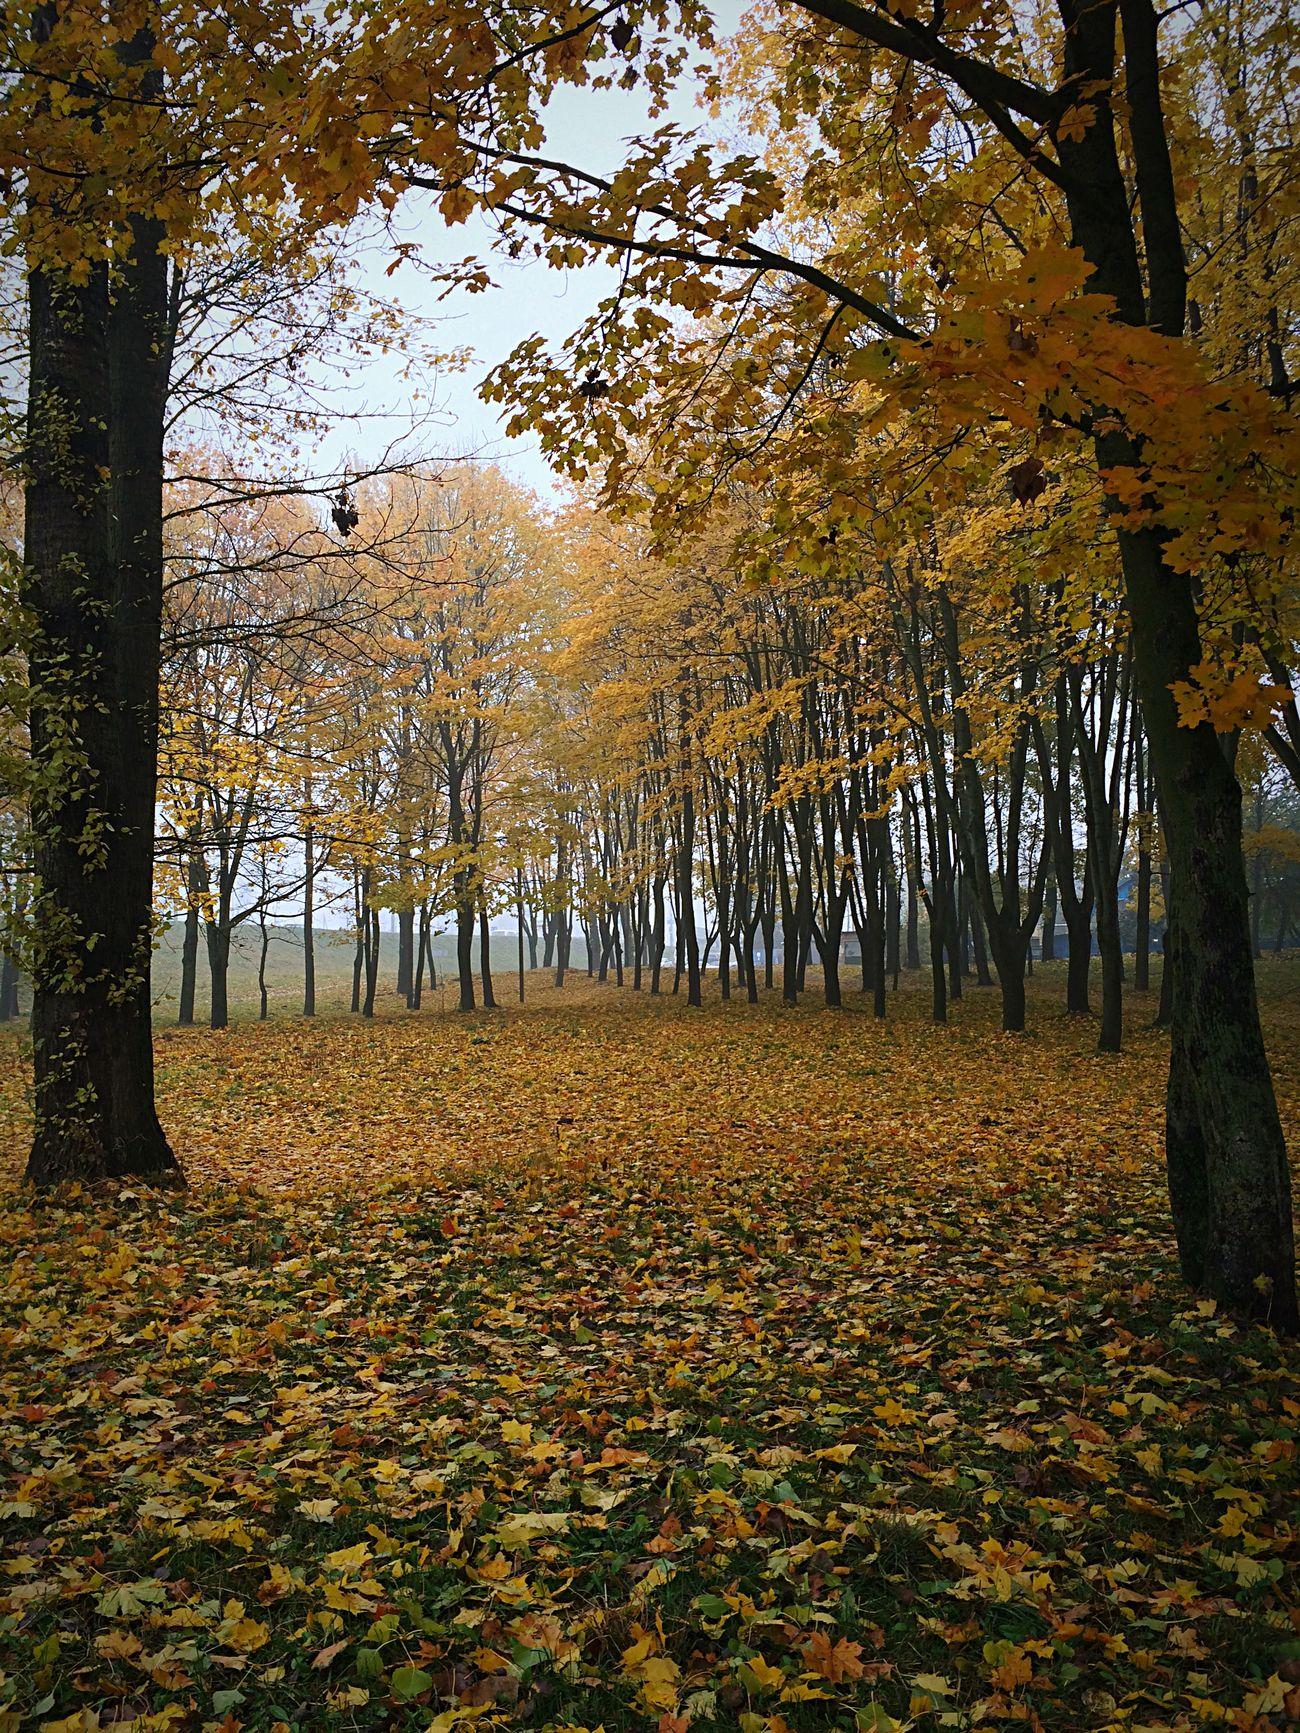 Sad autumn